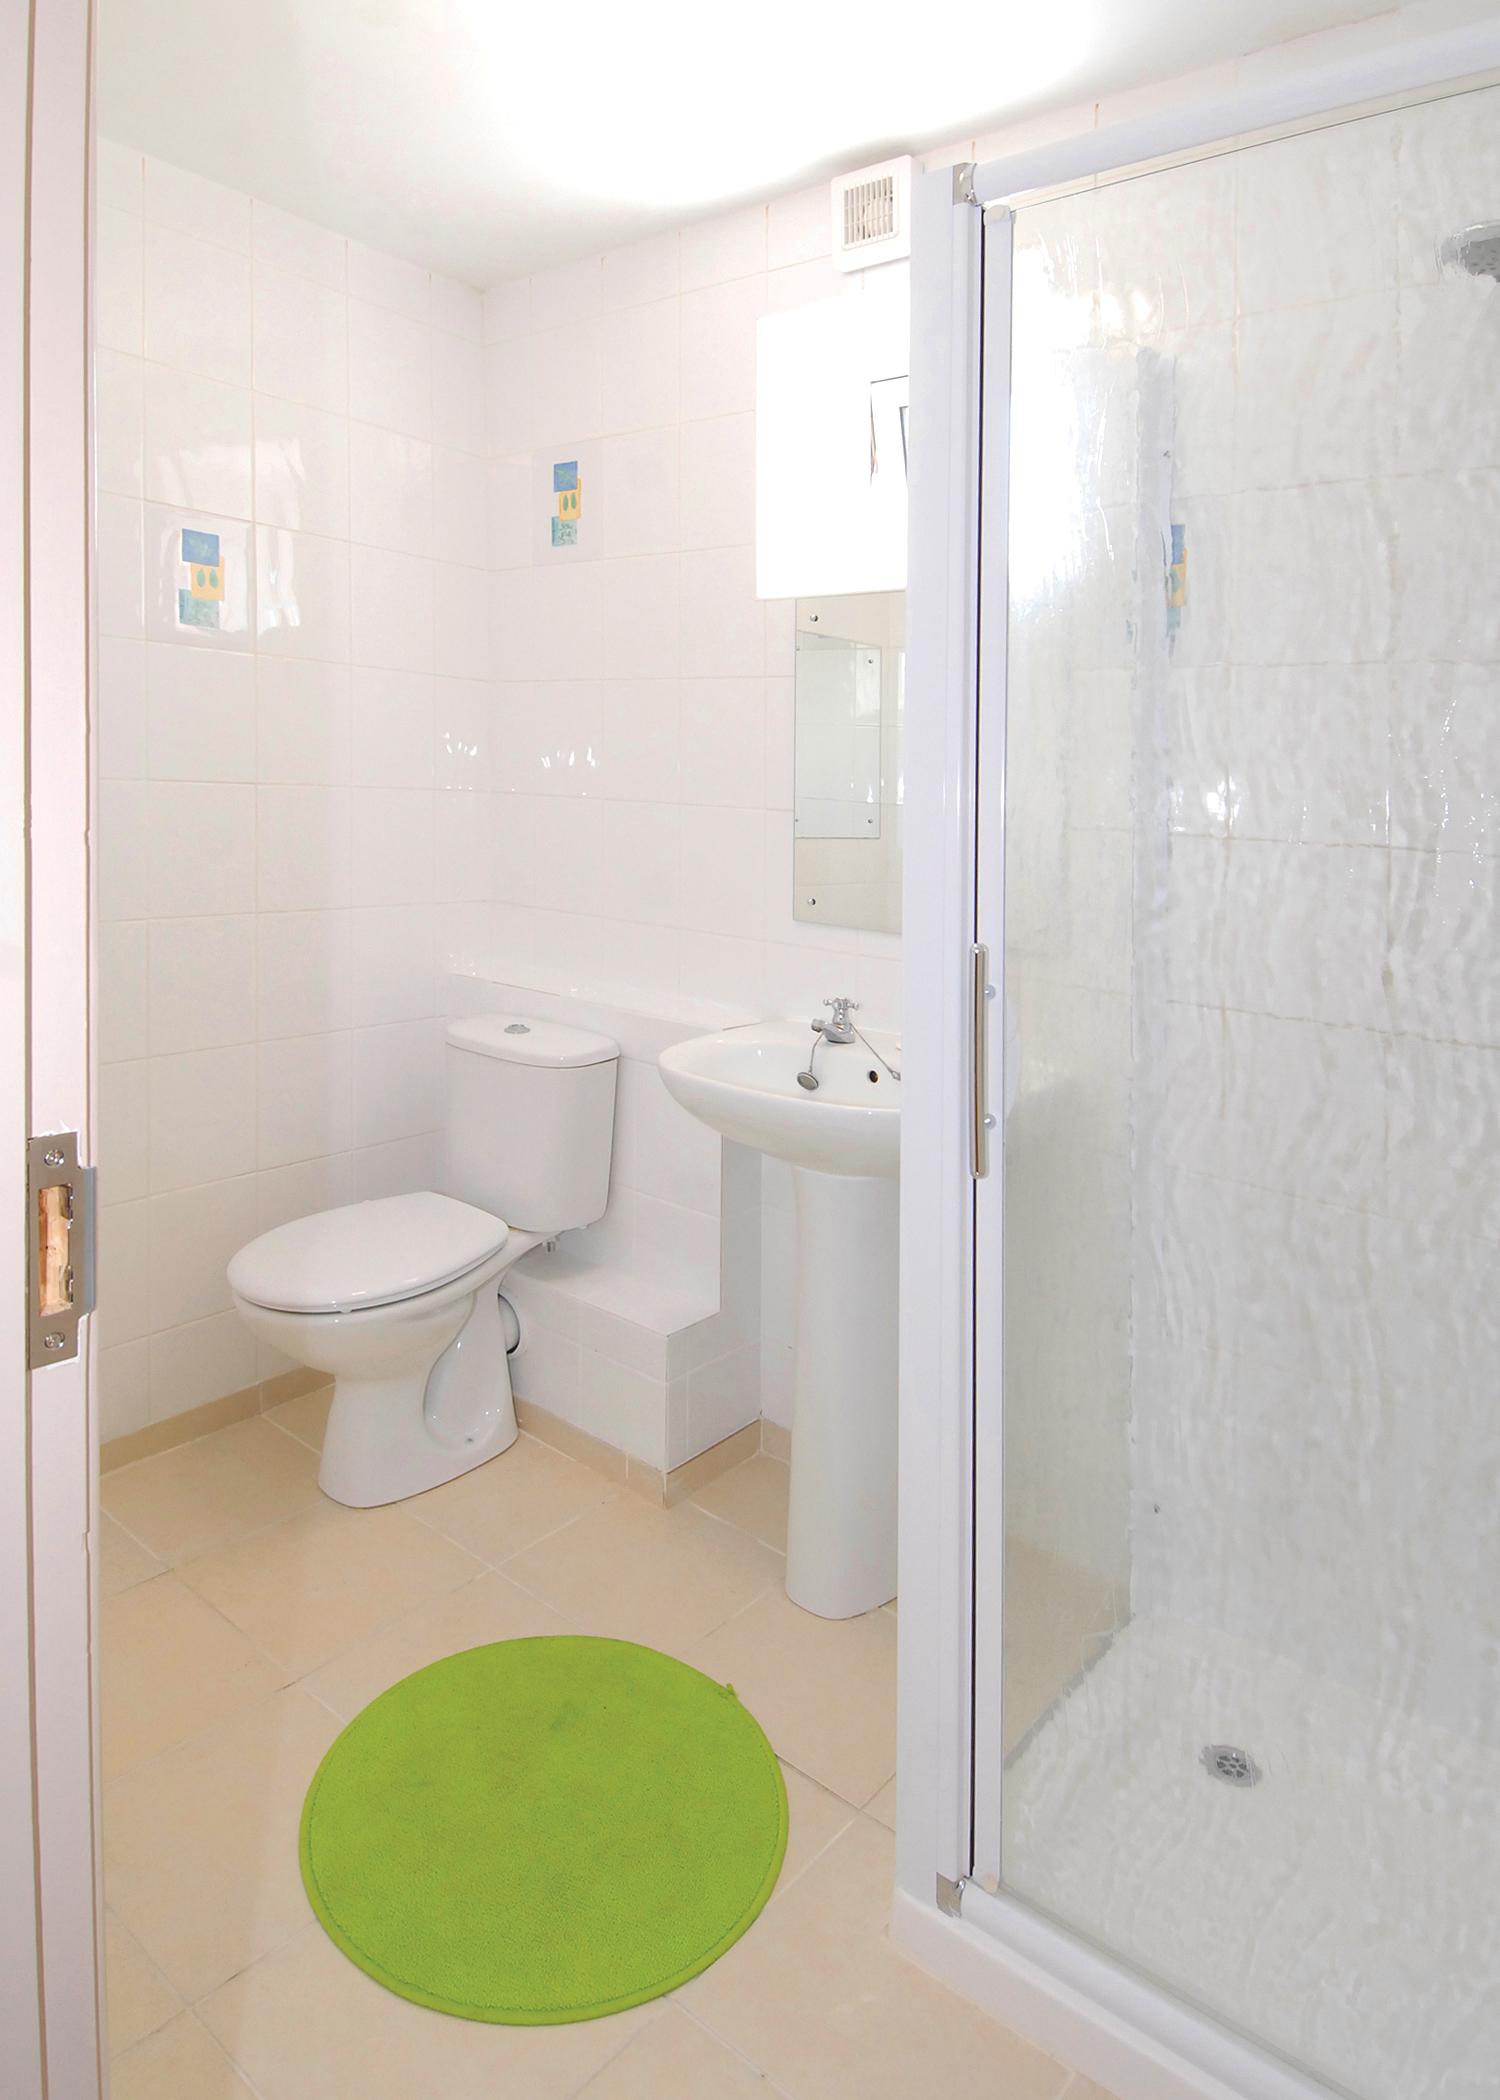 bathroom_8616377058_o.jpg